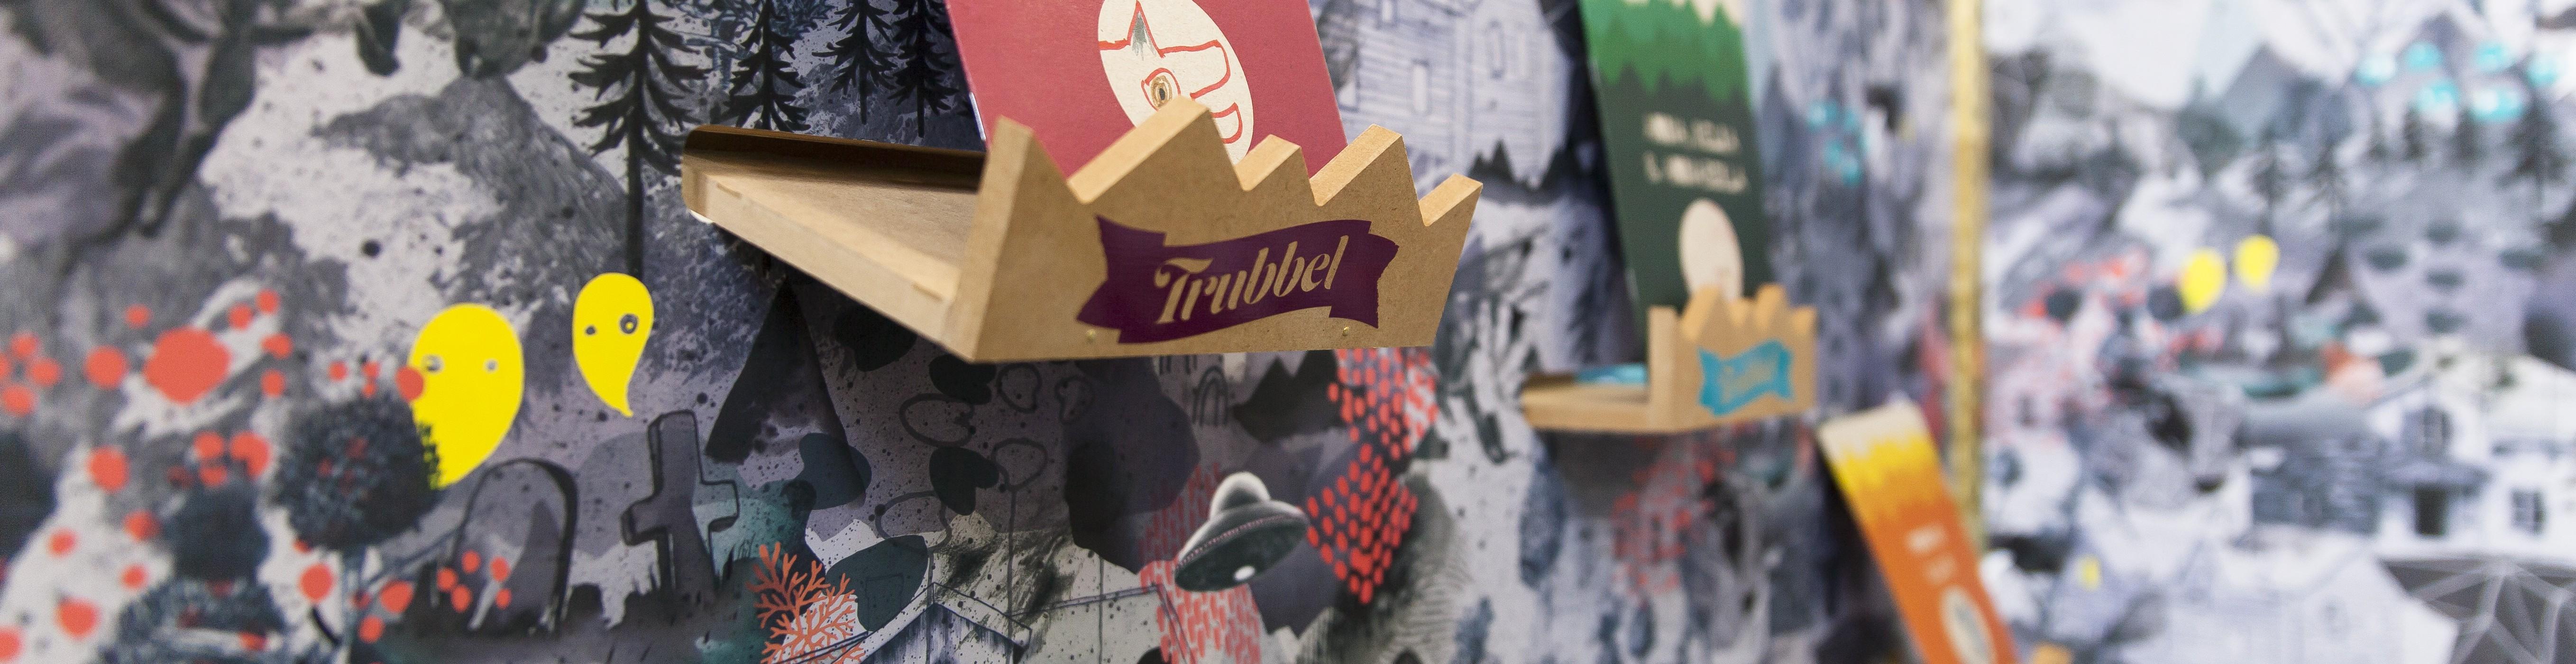 Trubbel-5